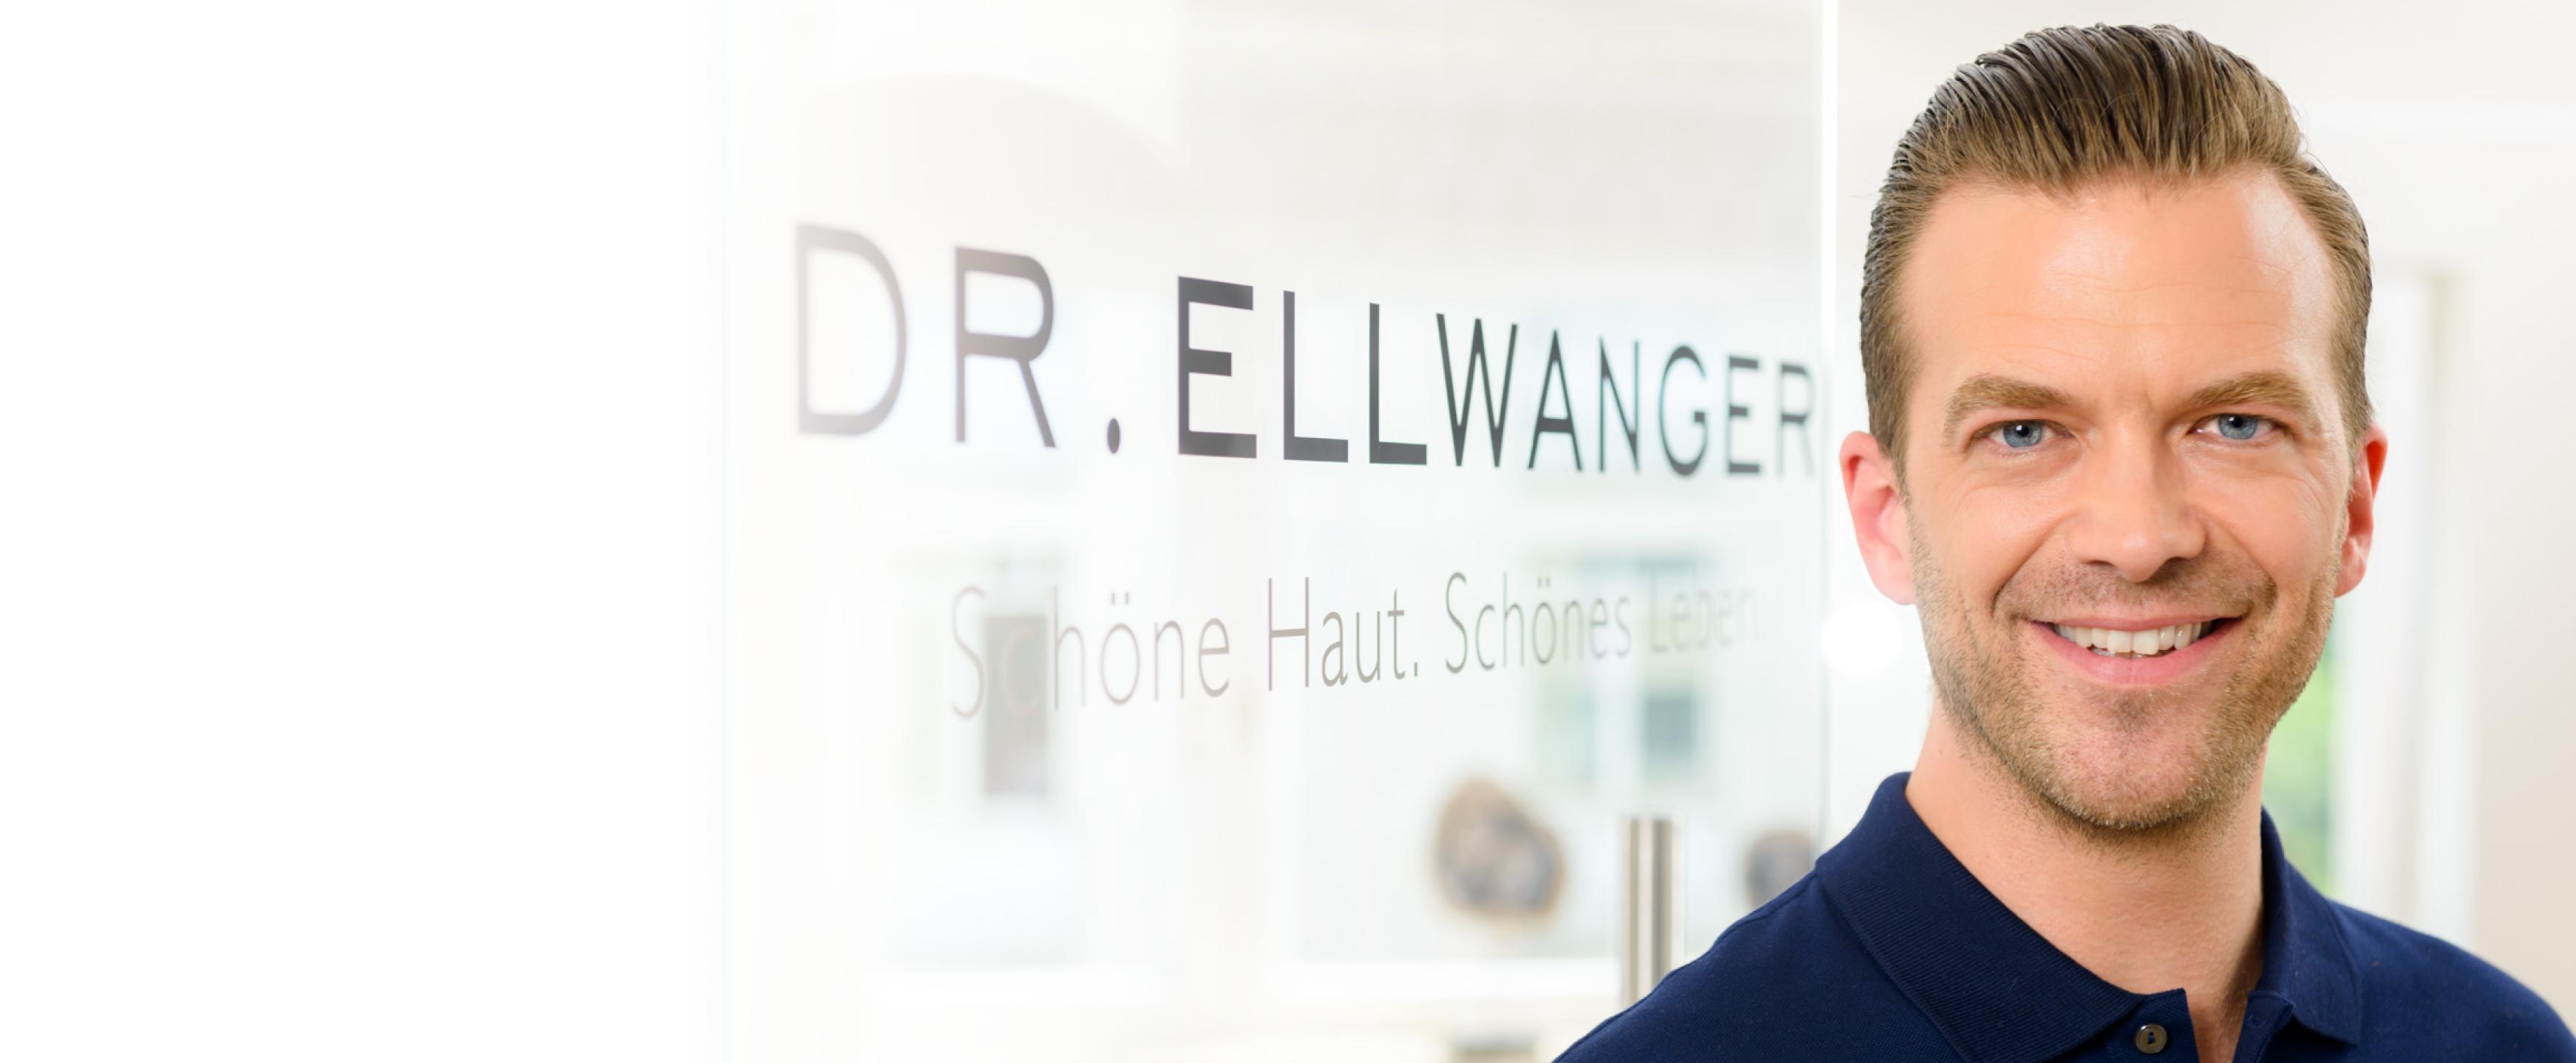 image 2 - Dr. ellwanger